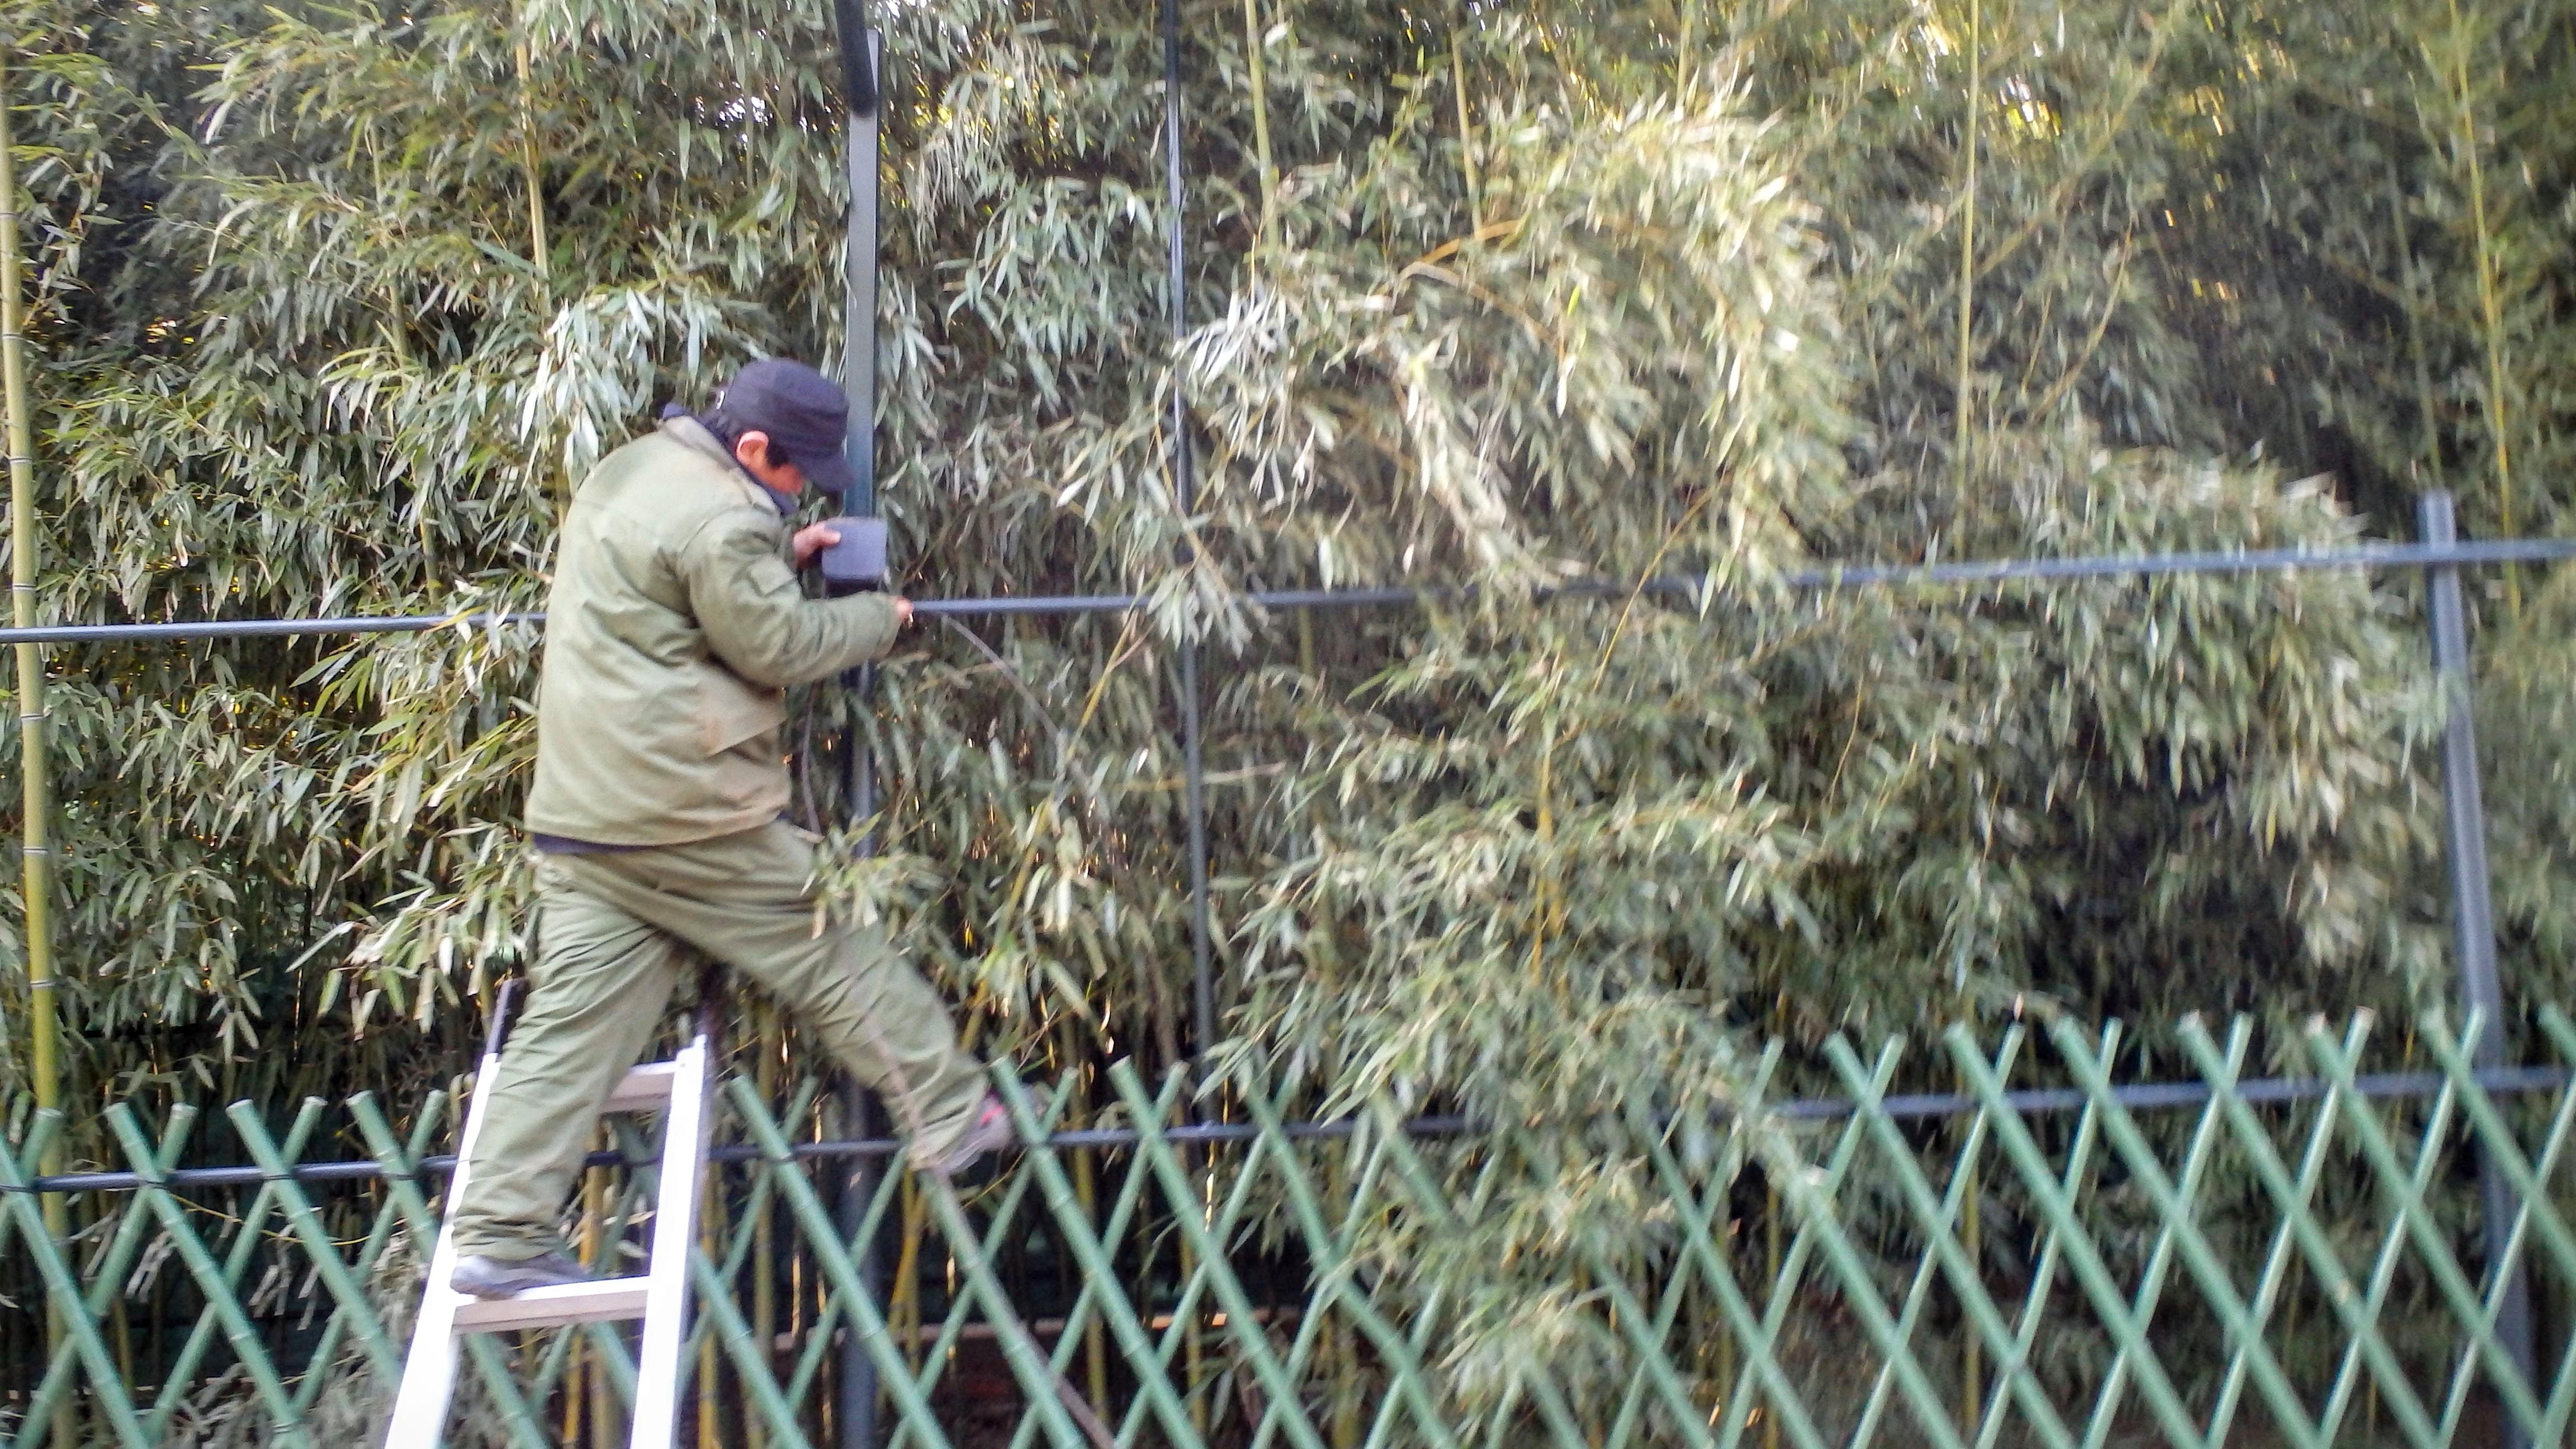 Хунло-Сы: мужик, бамбук. Страха нет!